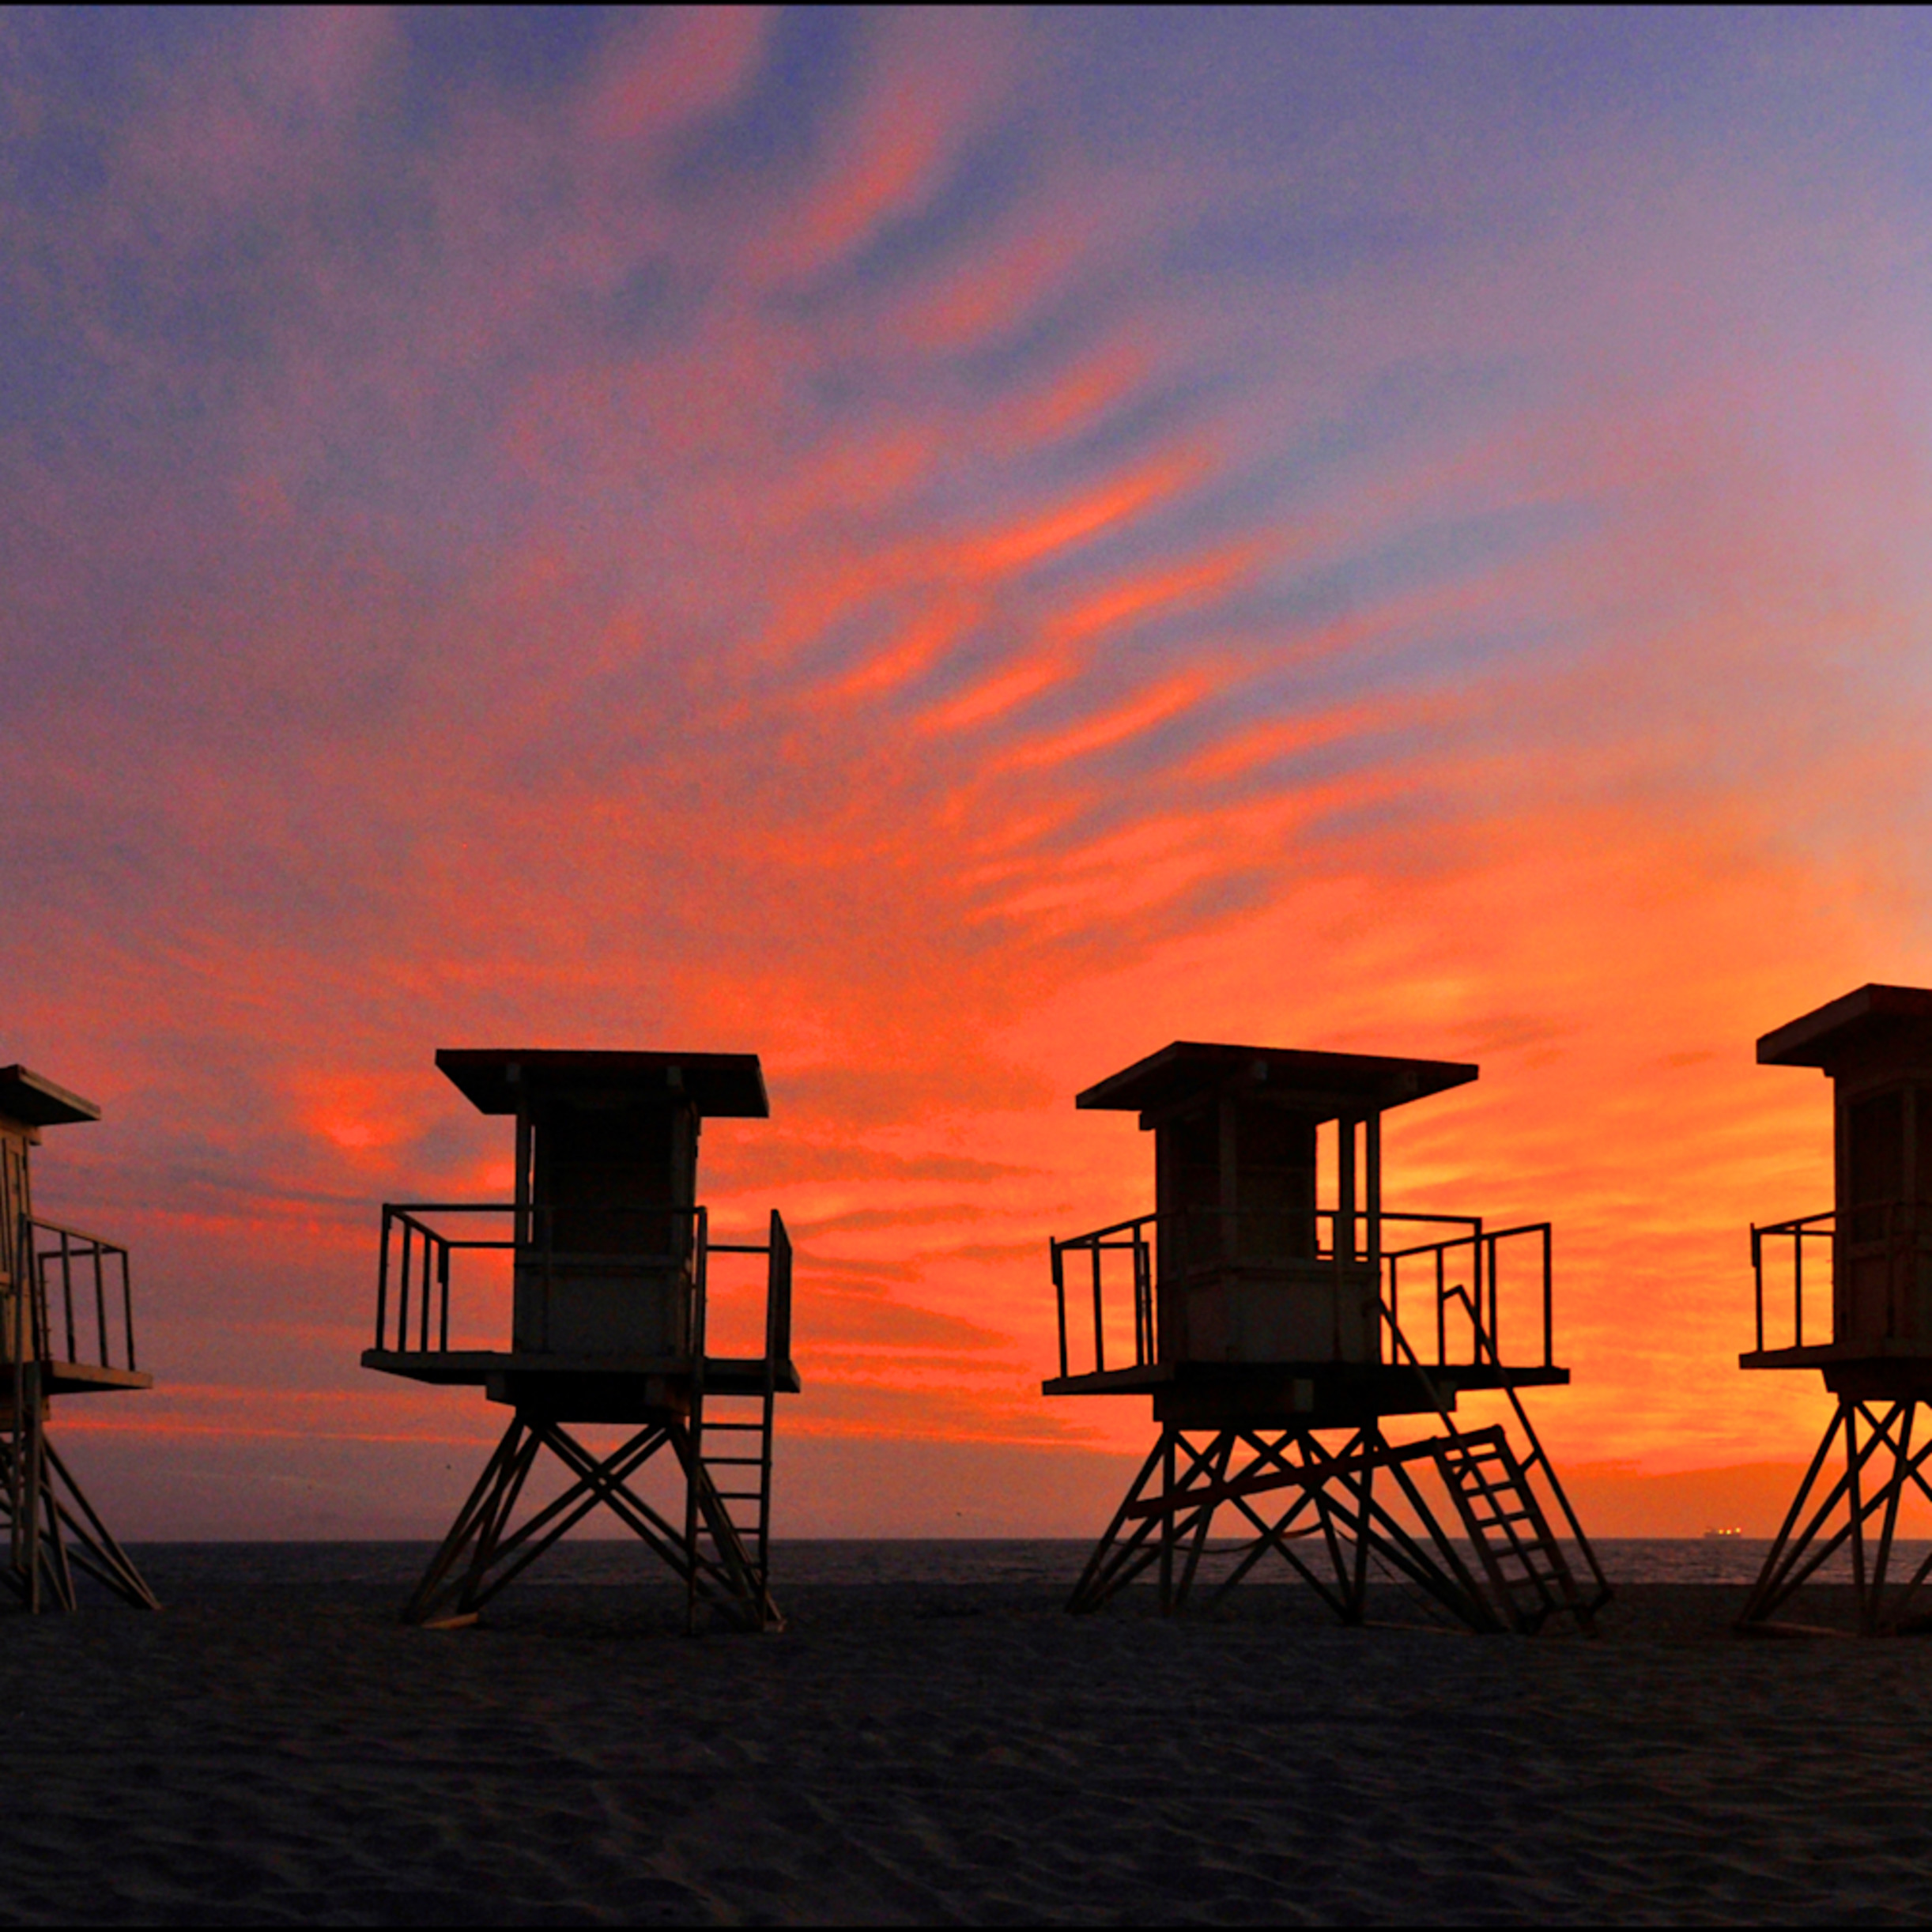 Hunting beach lifeguard stands panorama fgmocw